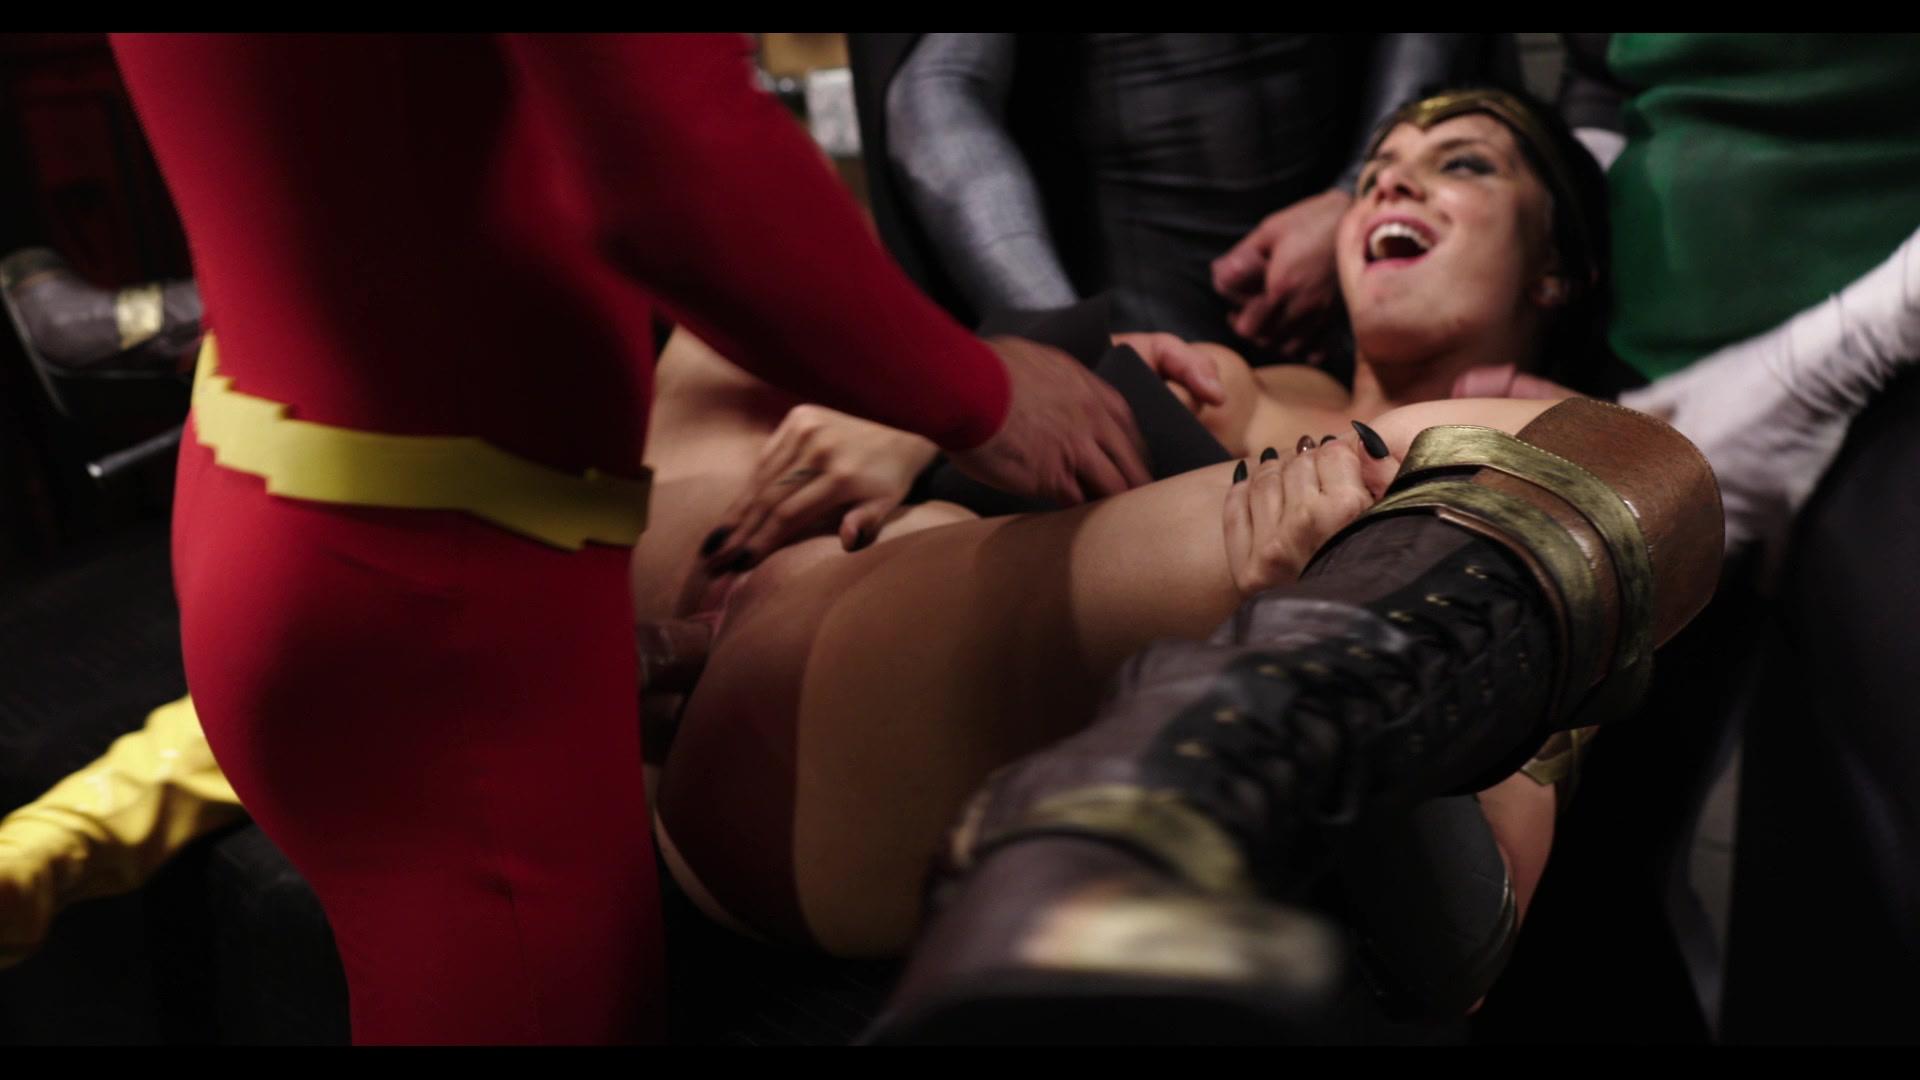 Scene with Xander Corvus, Tyler Nixon and Romi Rain - image 17 out of 20